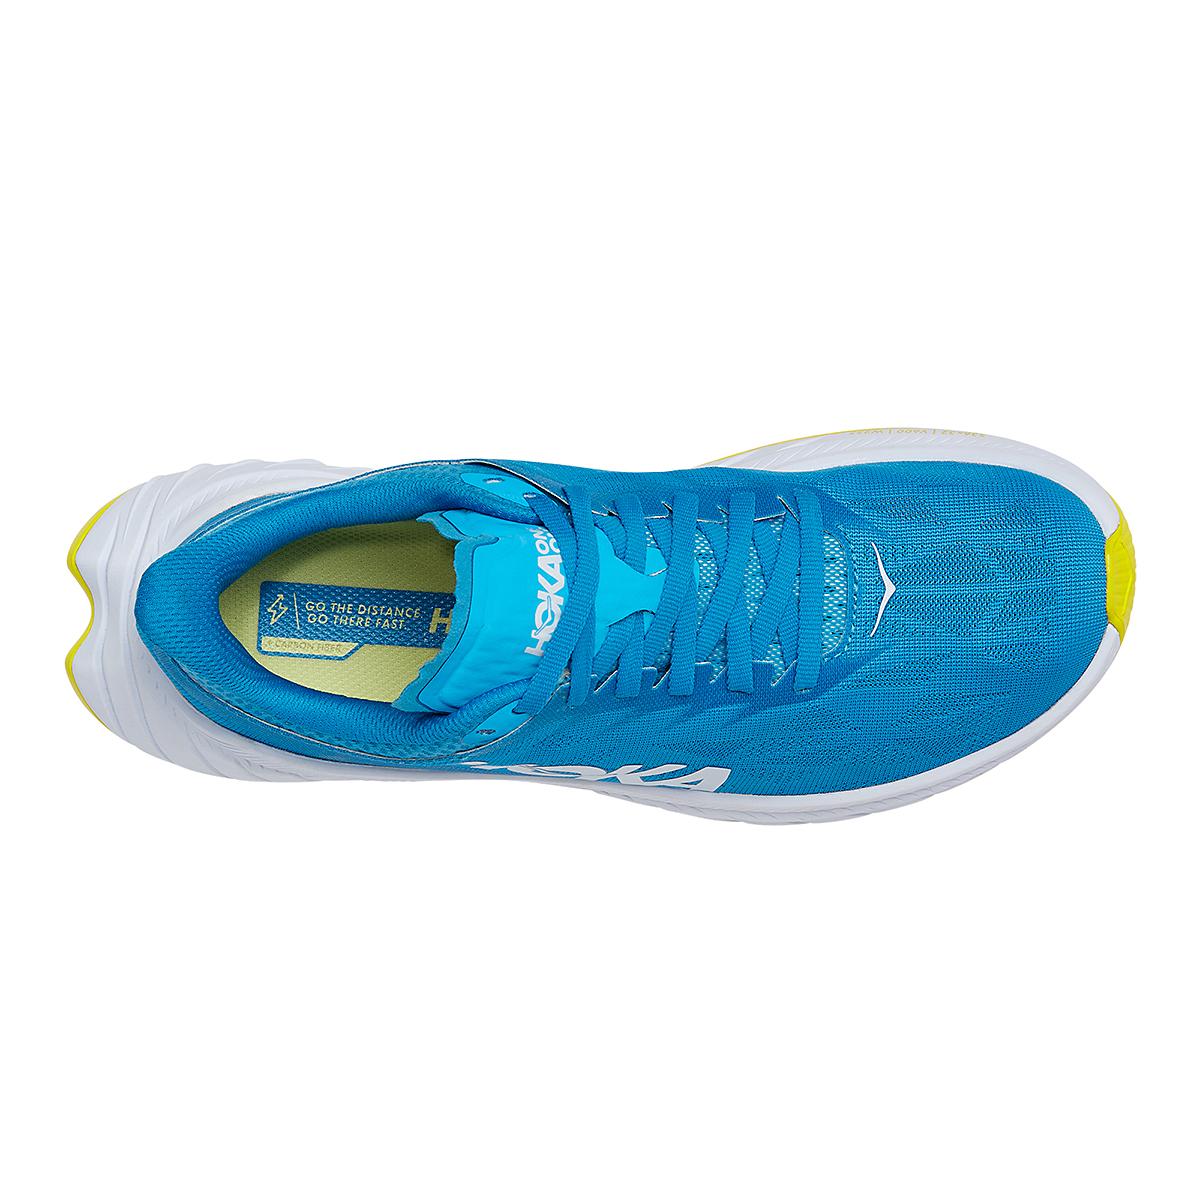 Women's Hoka One One Carbon X 2 Running Shoe - Color: Diva Blue/Citron - Size: 5 - Width: Regular, Diva Blue/Citron, large, image 5